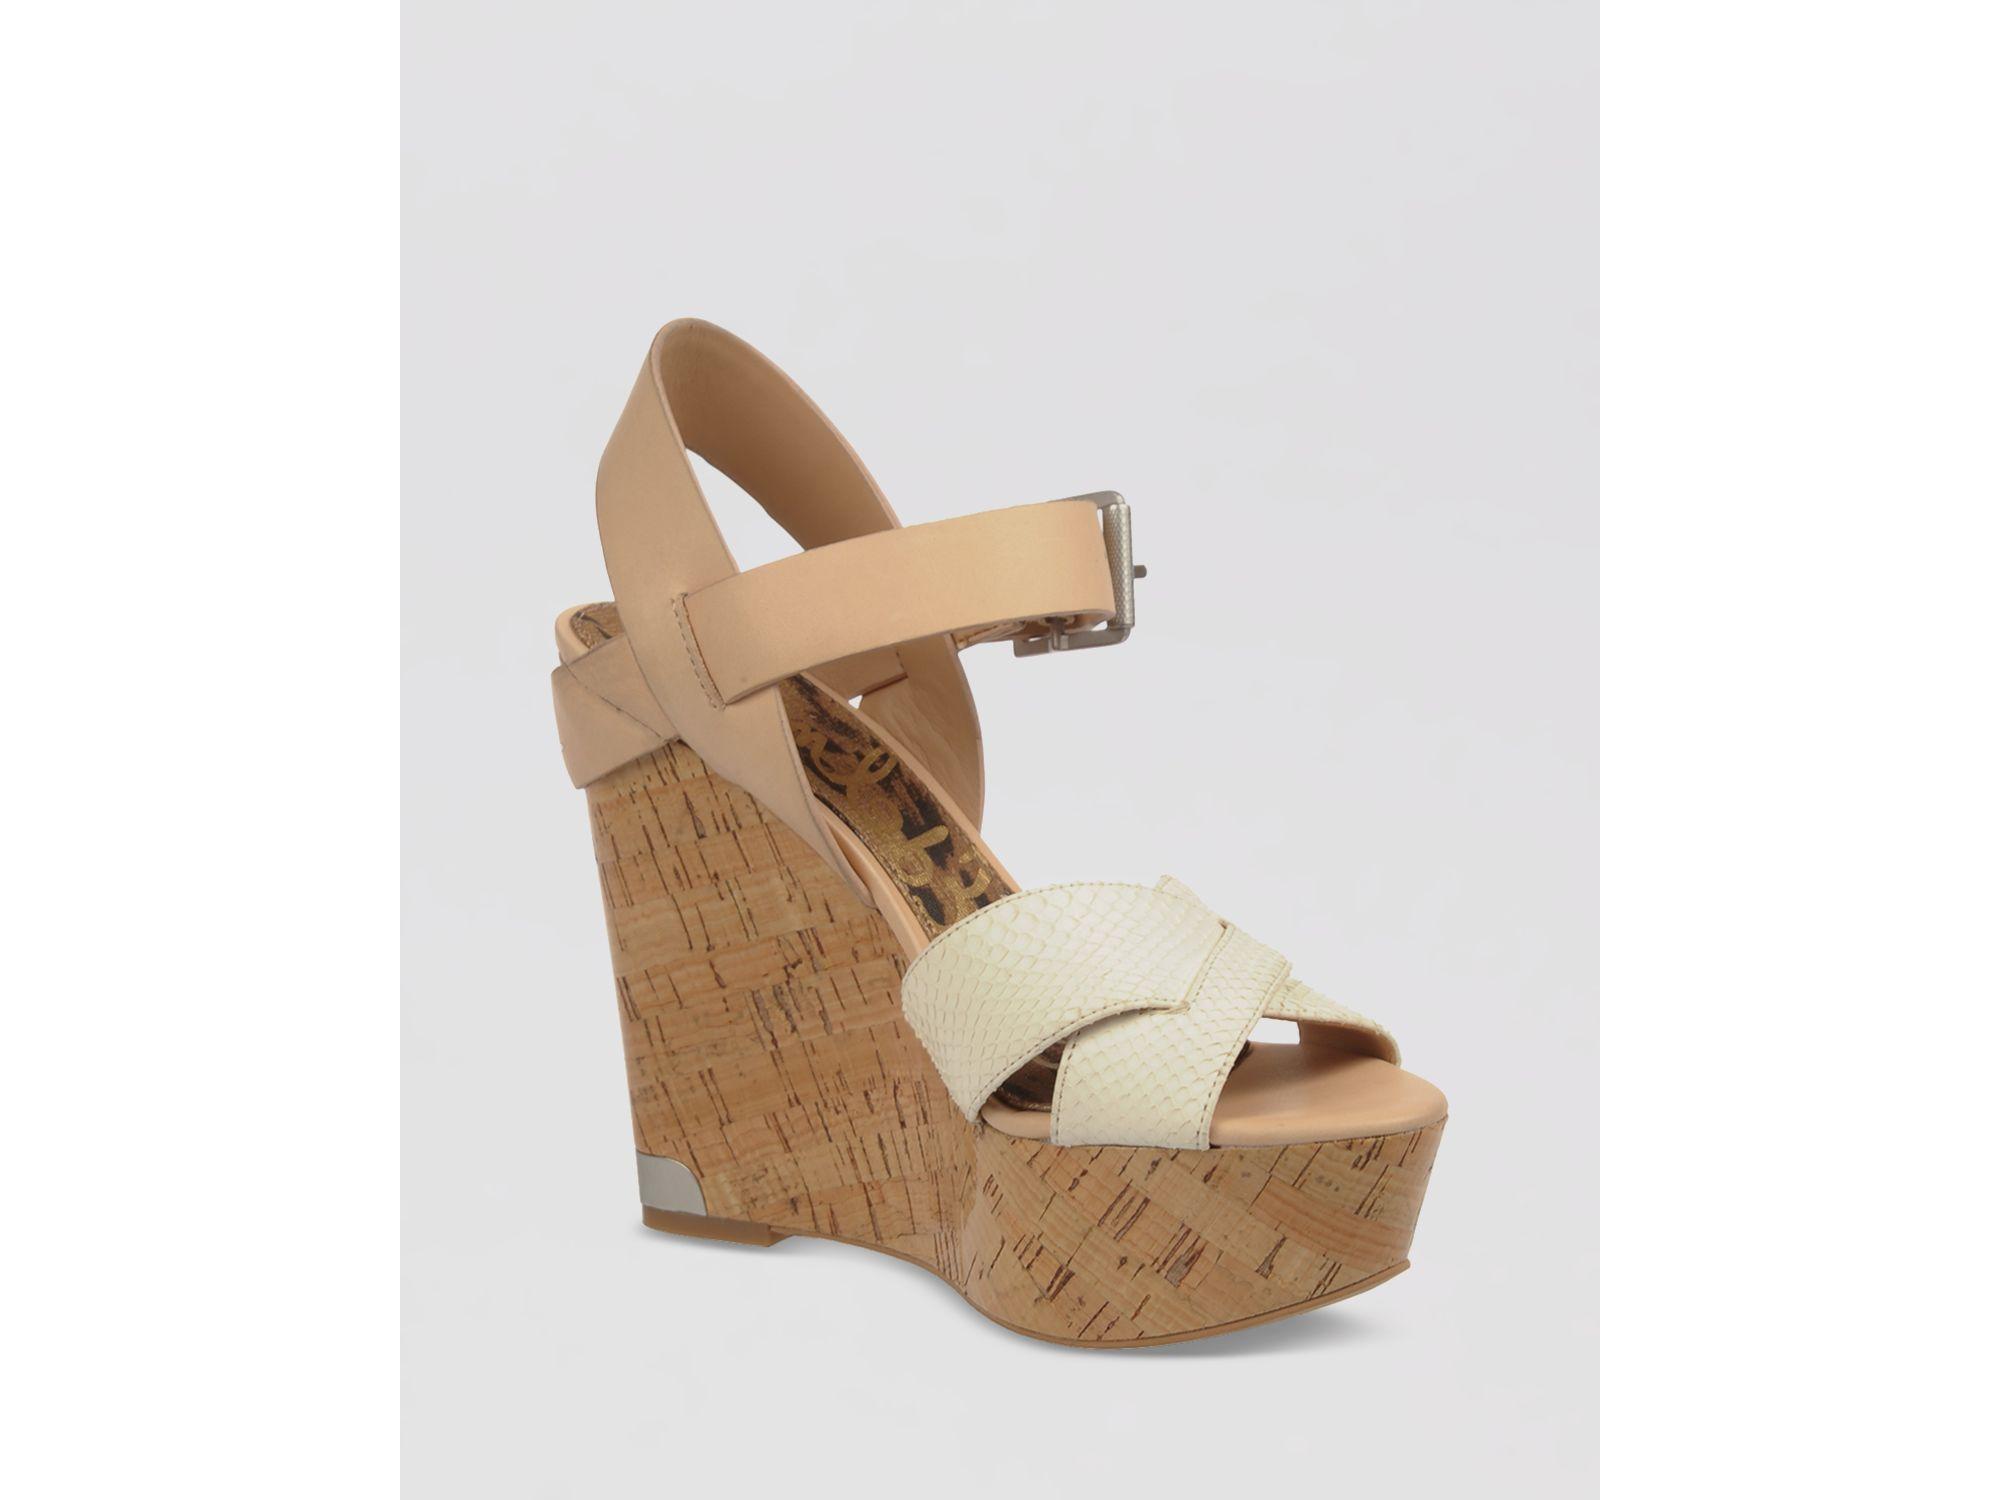 e80c2700792f48 Lyst - Sam Edelman Platform Wedge Sandals Sasha in Natural